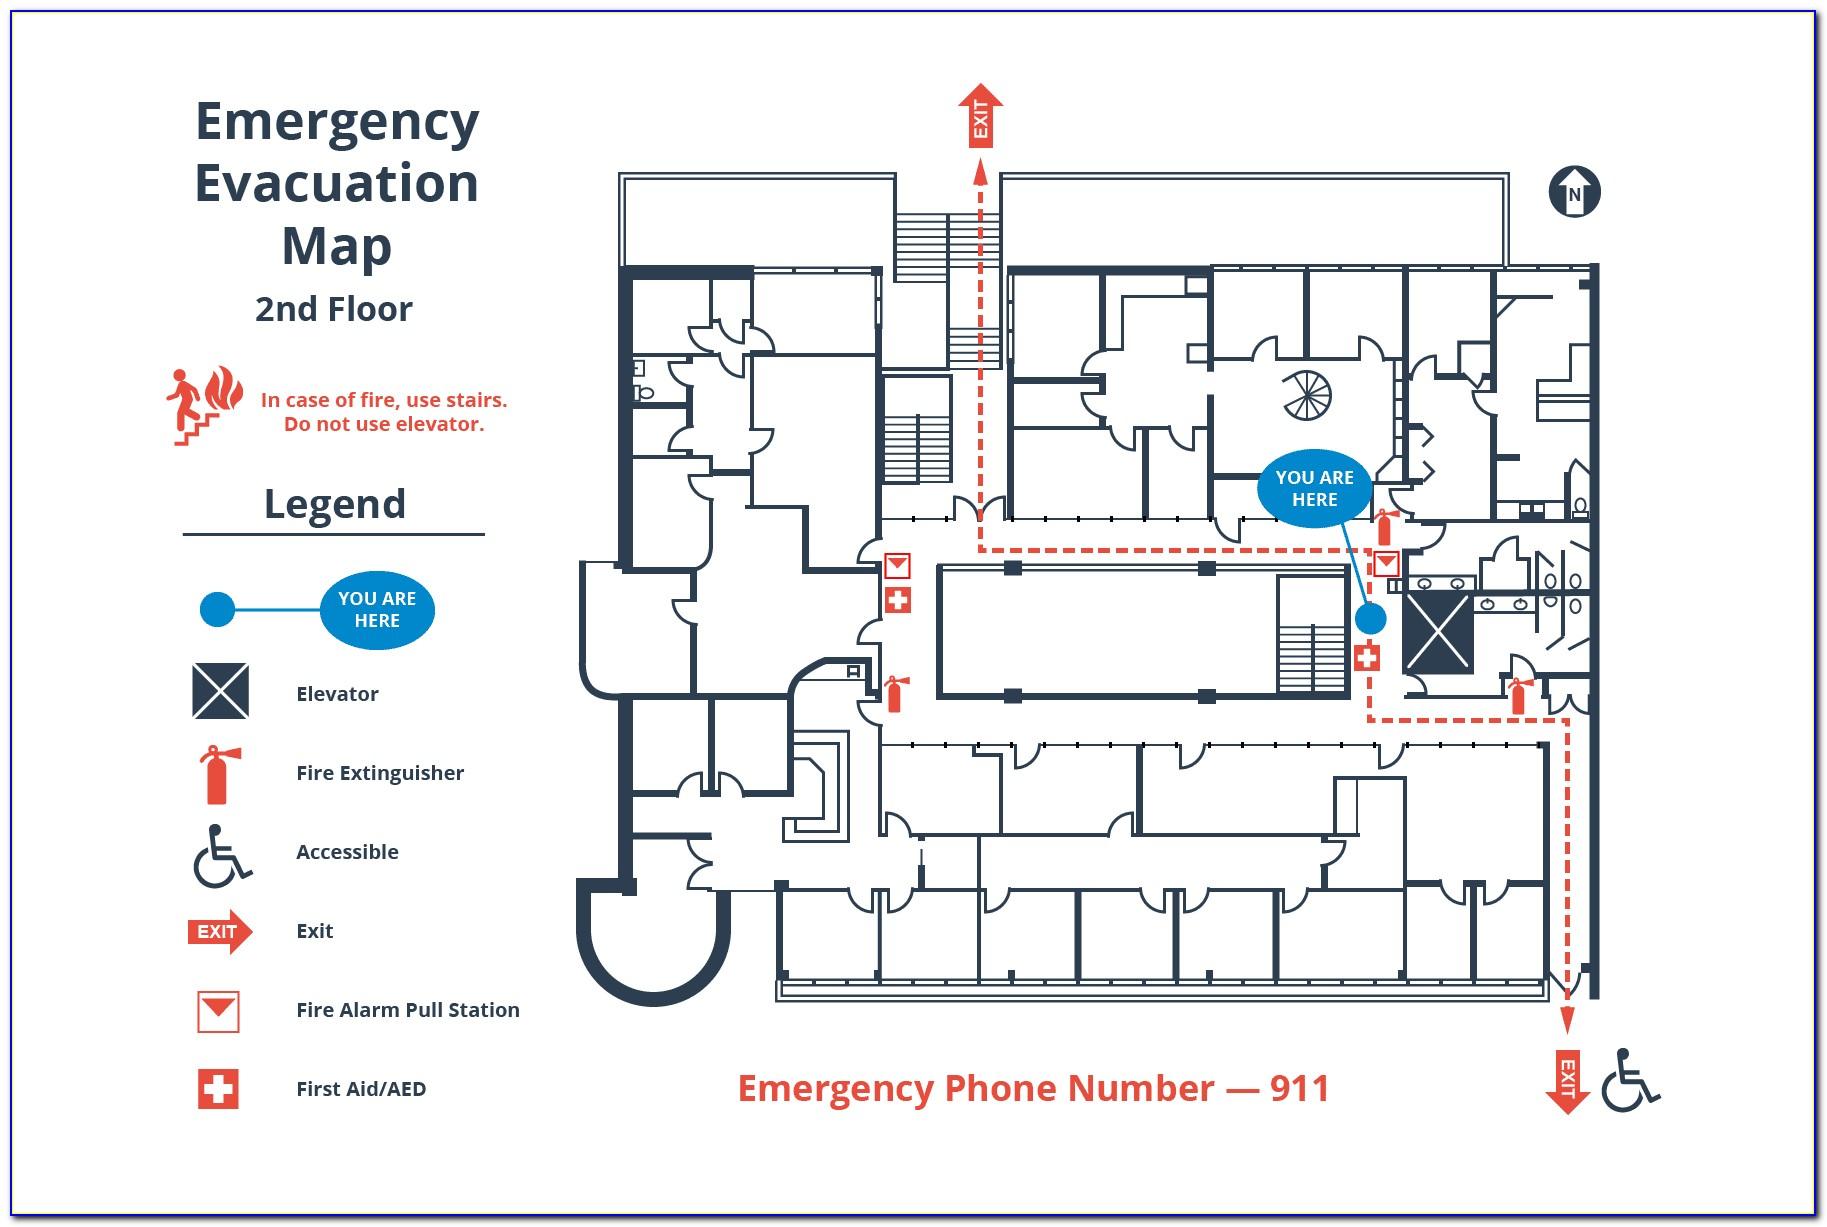 Emergency Evacuation Procedure Example